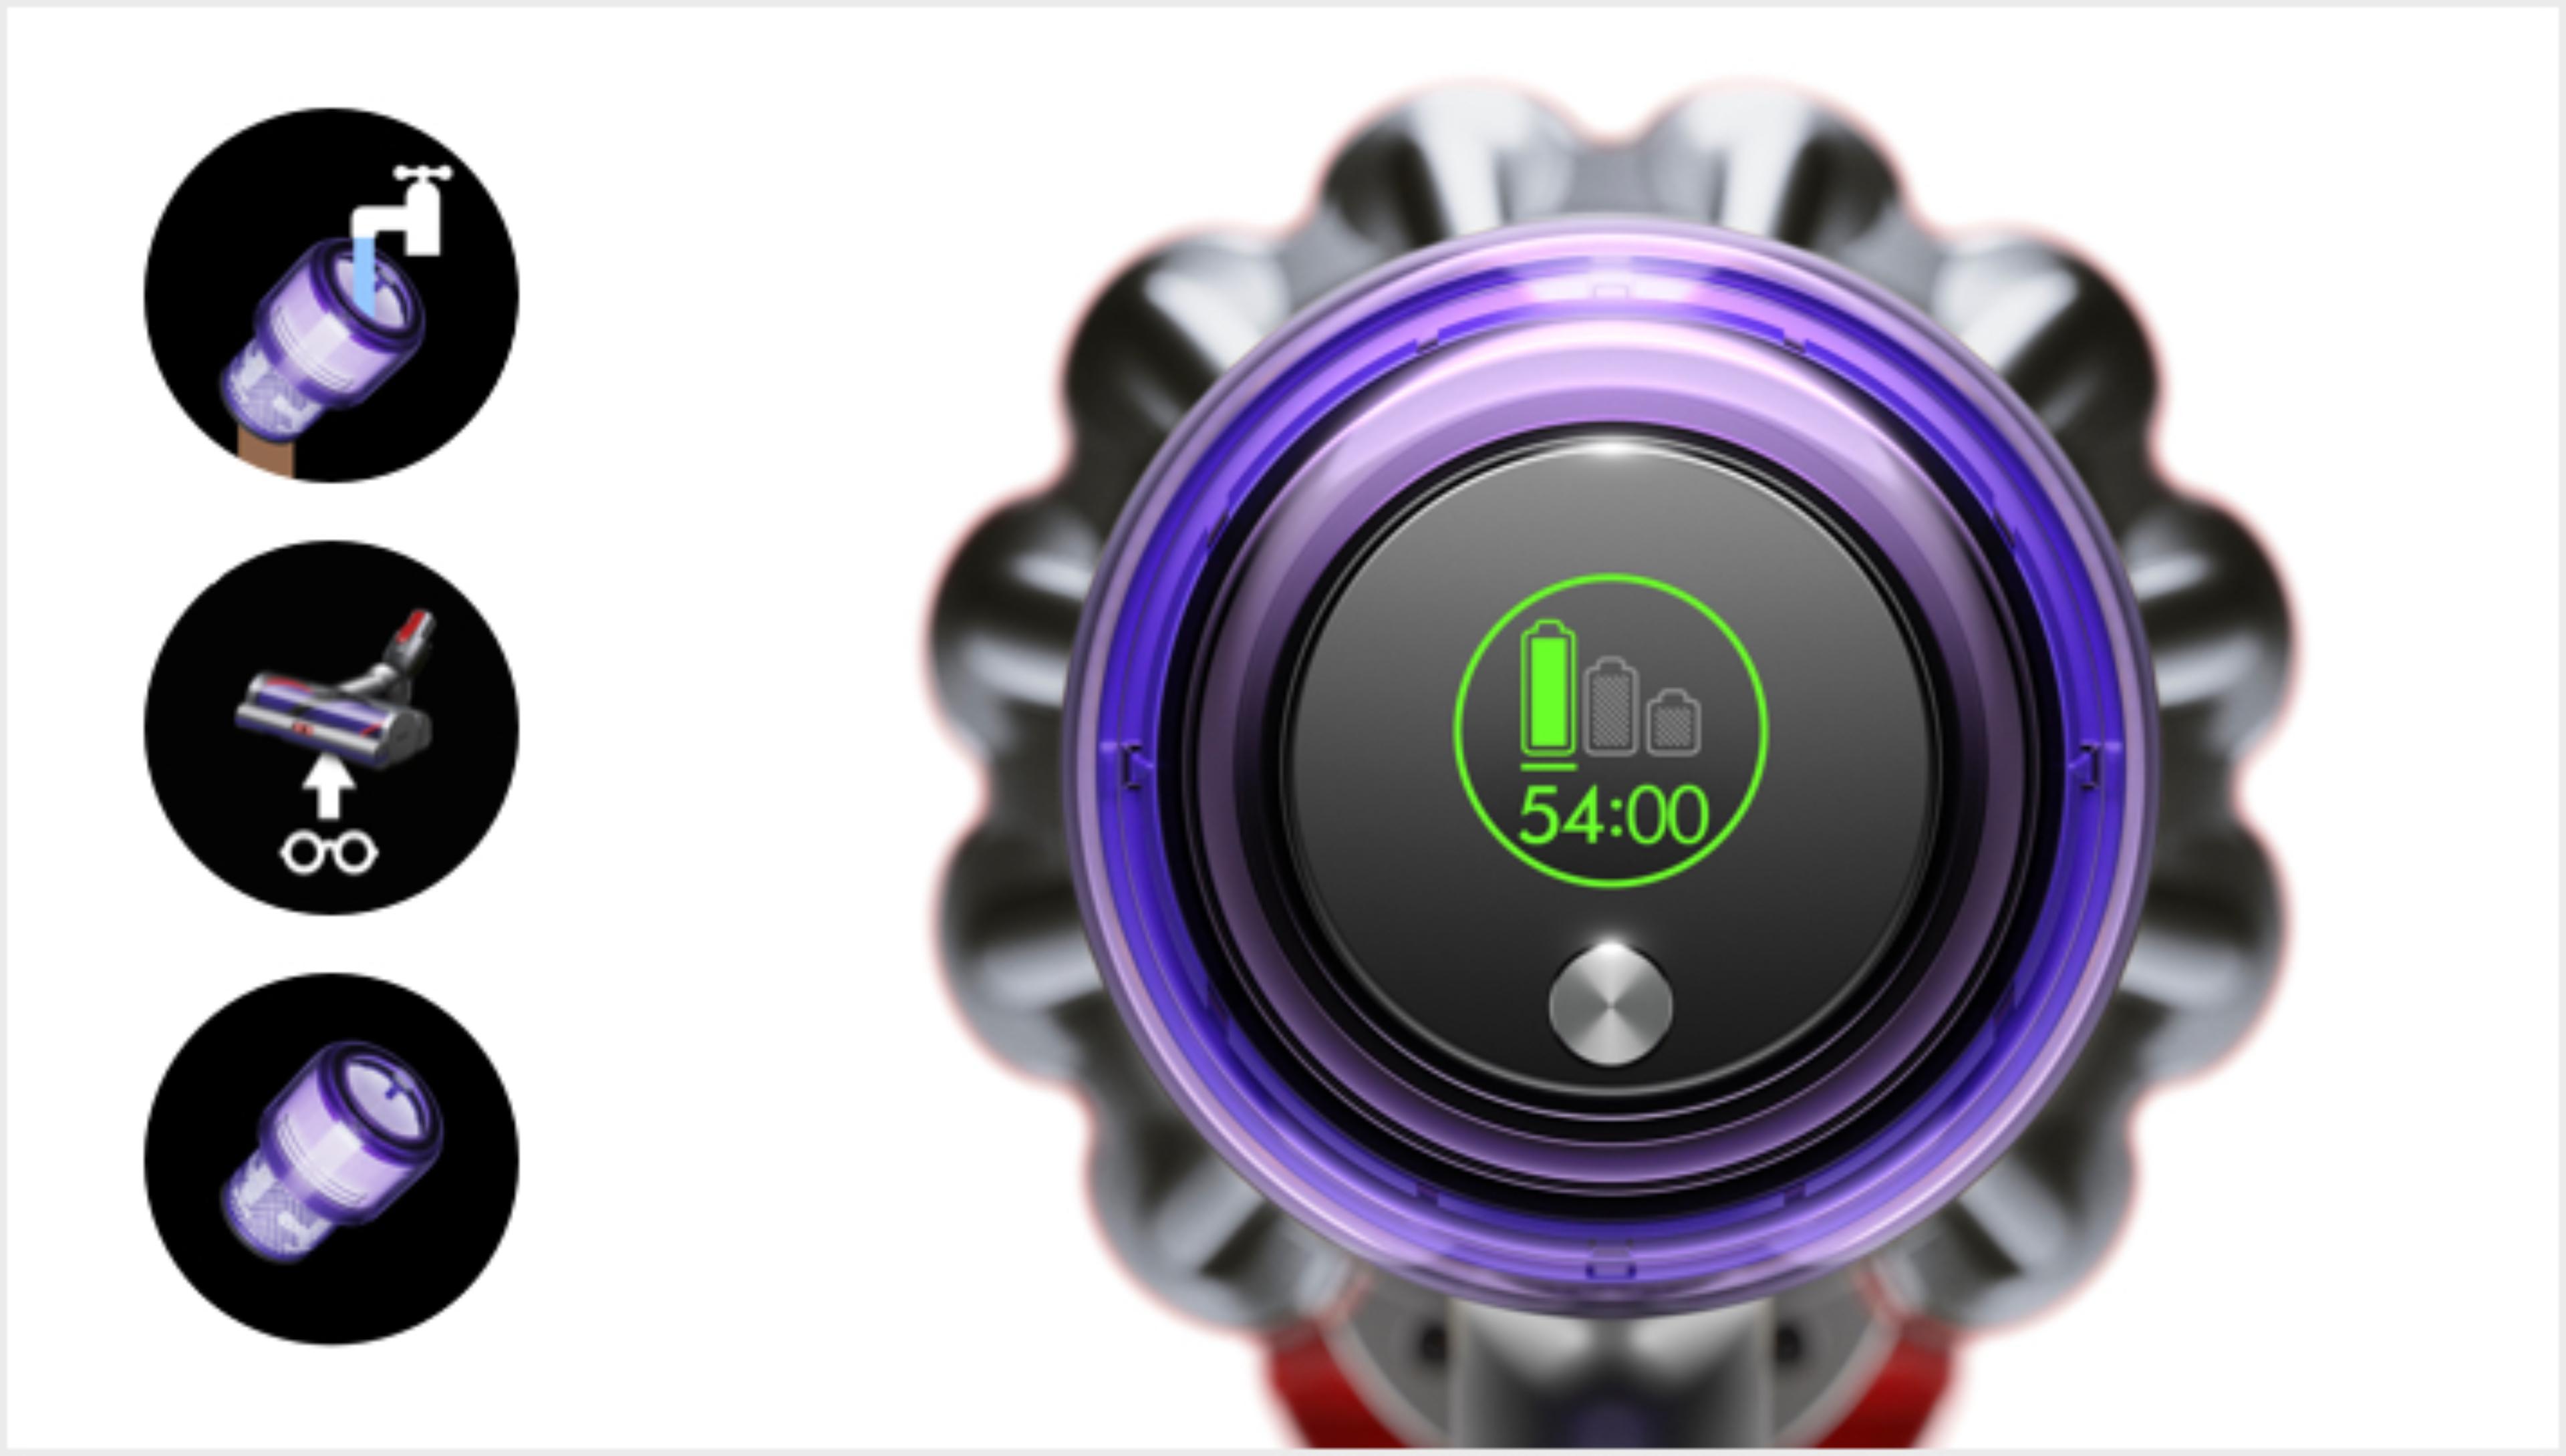 La pantalla LCD de la aspiradora Dyson V11 Outsize mostrando una cuenta regresiva